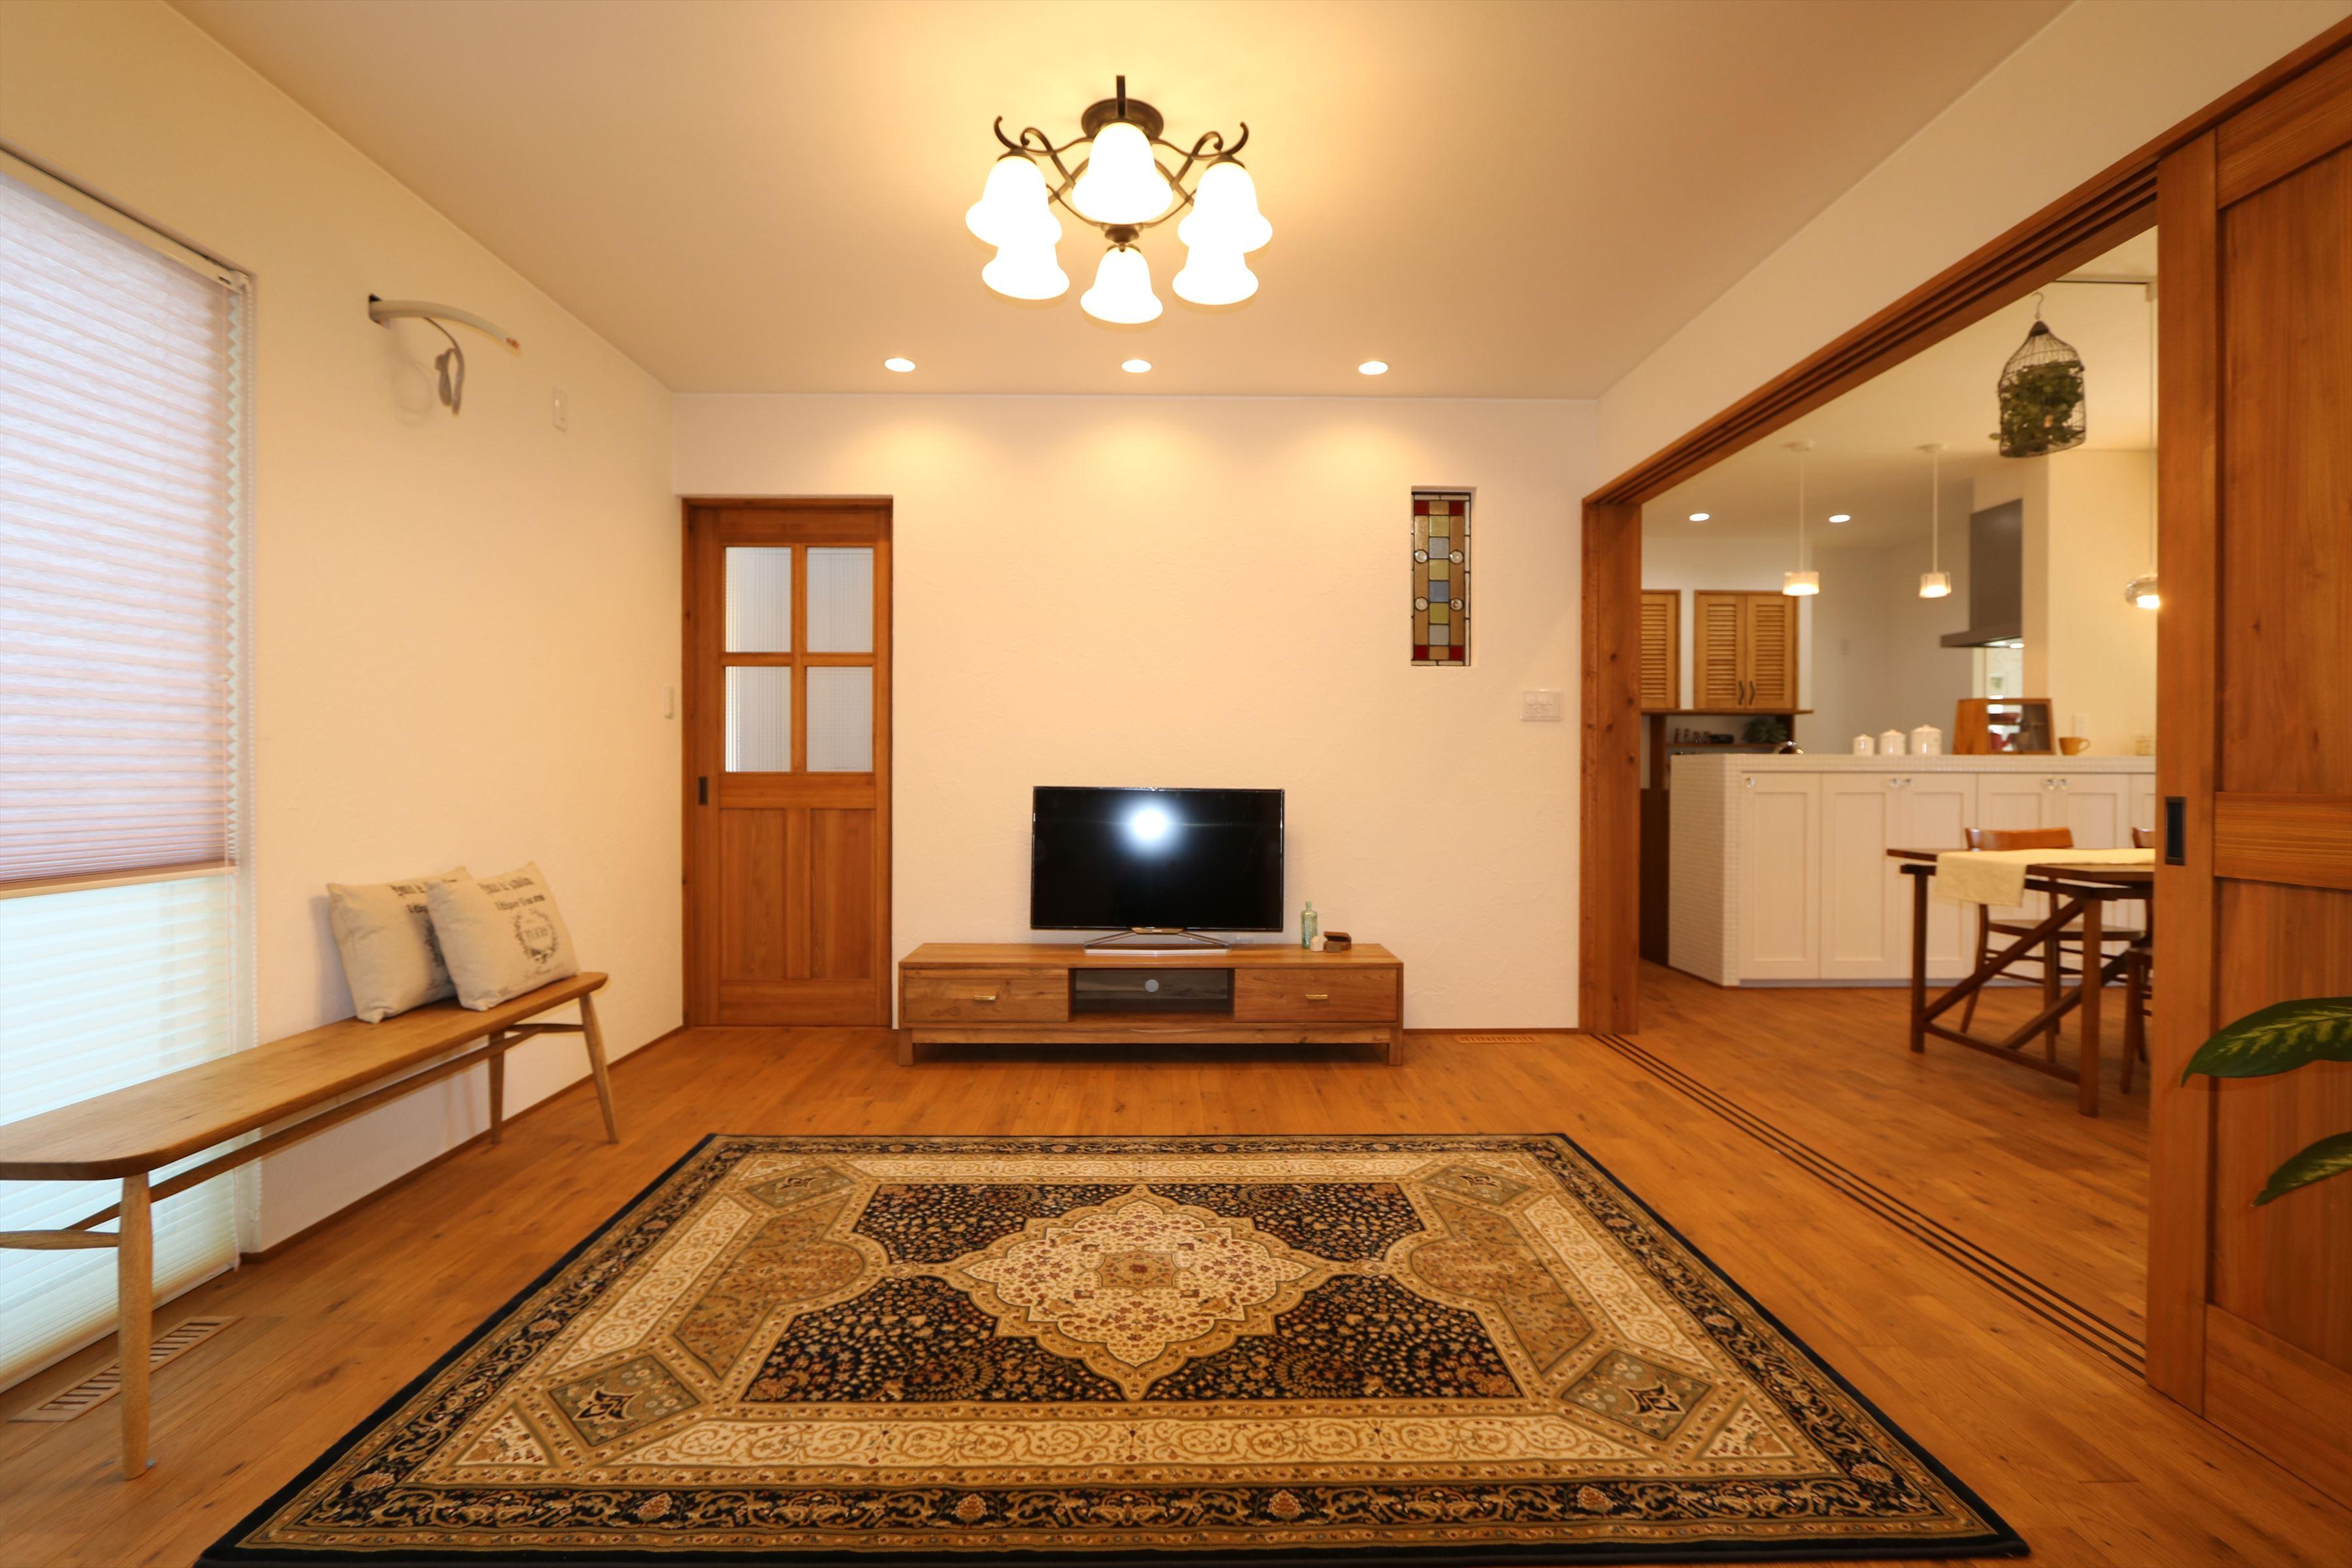 FRENCH STYLE 石川県金沢市の注文住宅・デザイン性・新築の家・戸建て E-HOUSE